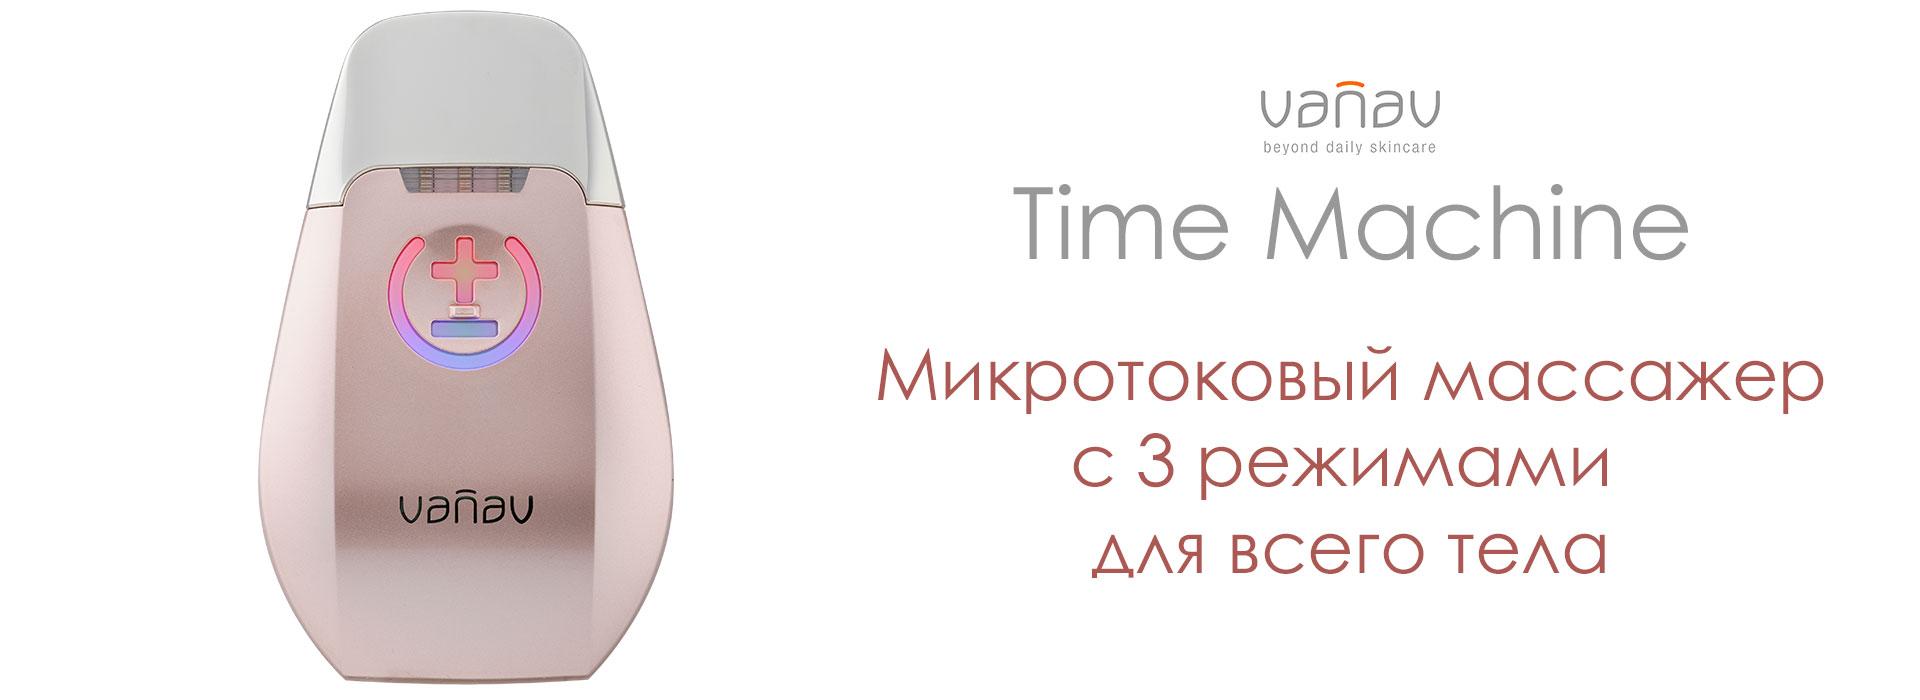 Микротоковый массажер VANAV TimeMachine